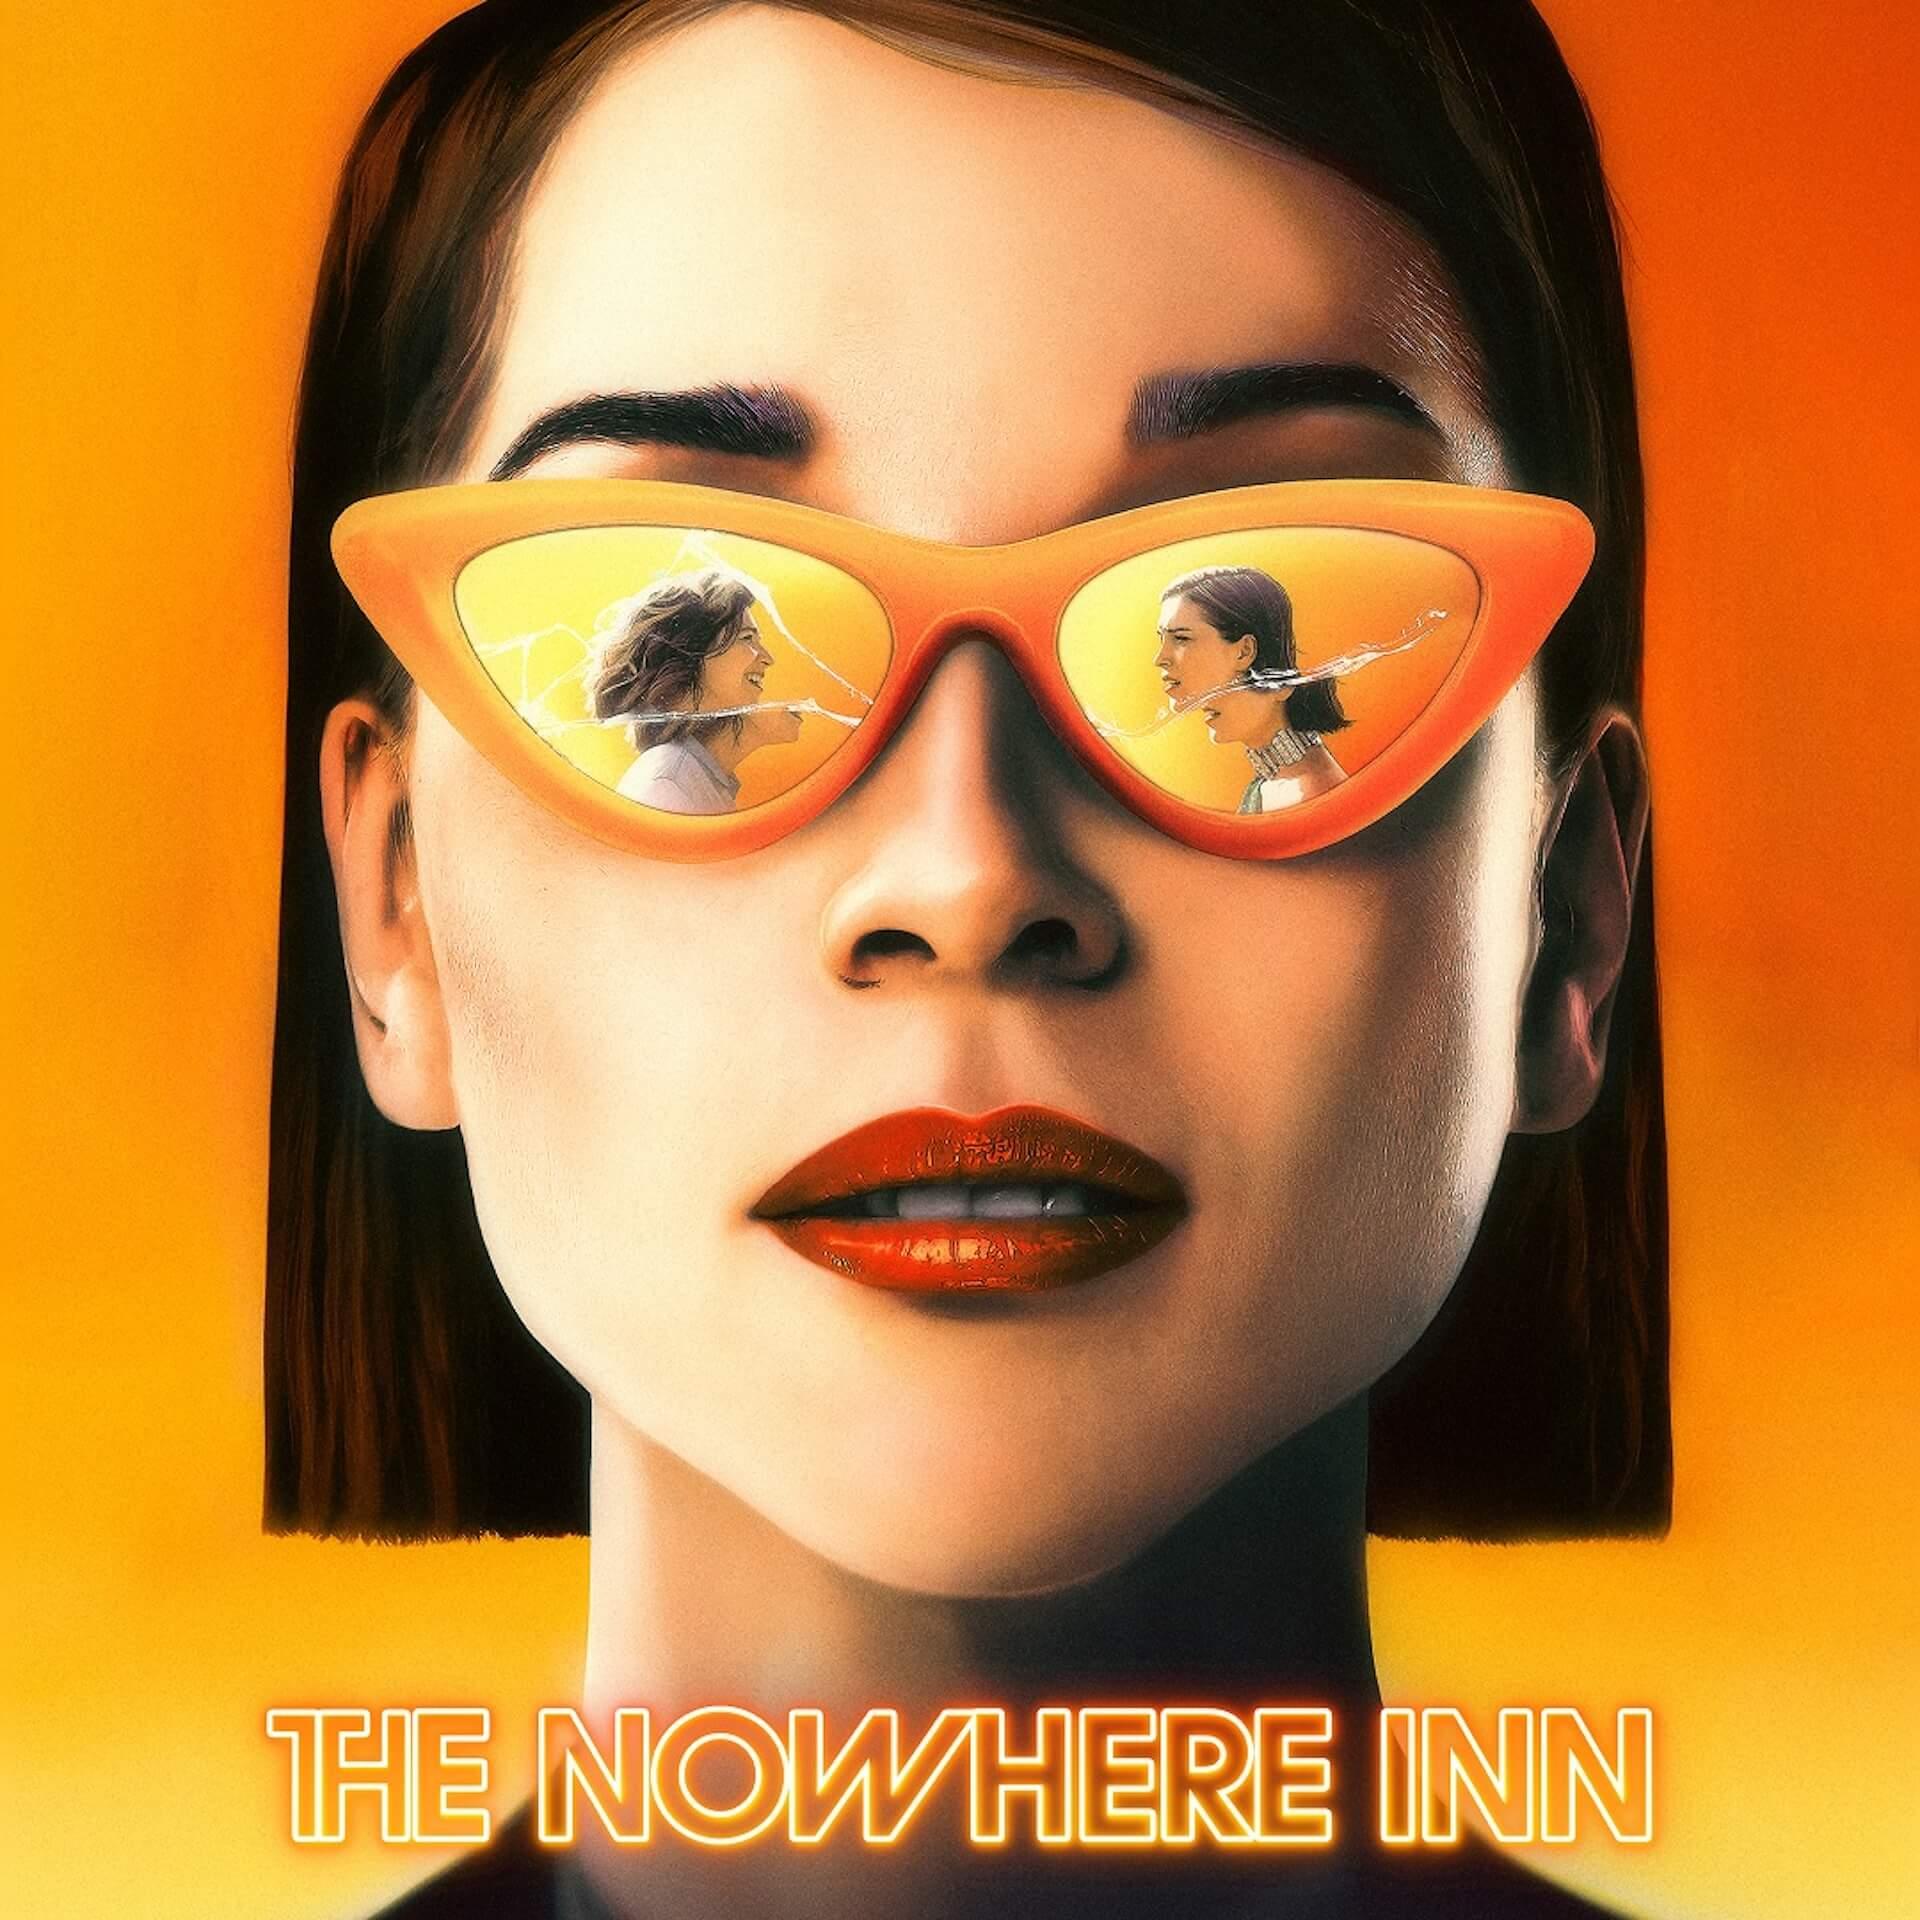 St. Vincentが主演を務める映画『The Nowhere Inn』のサウンドトラックがリリース決定!表題曲のMVも解禁 music210915_st_vincent_01